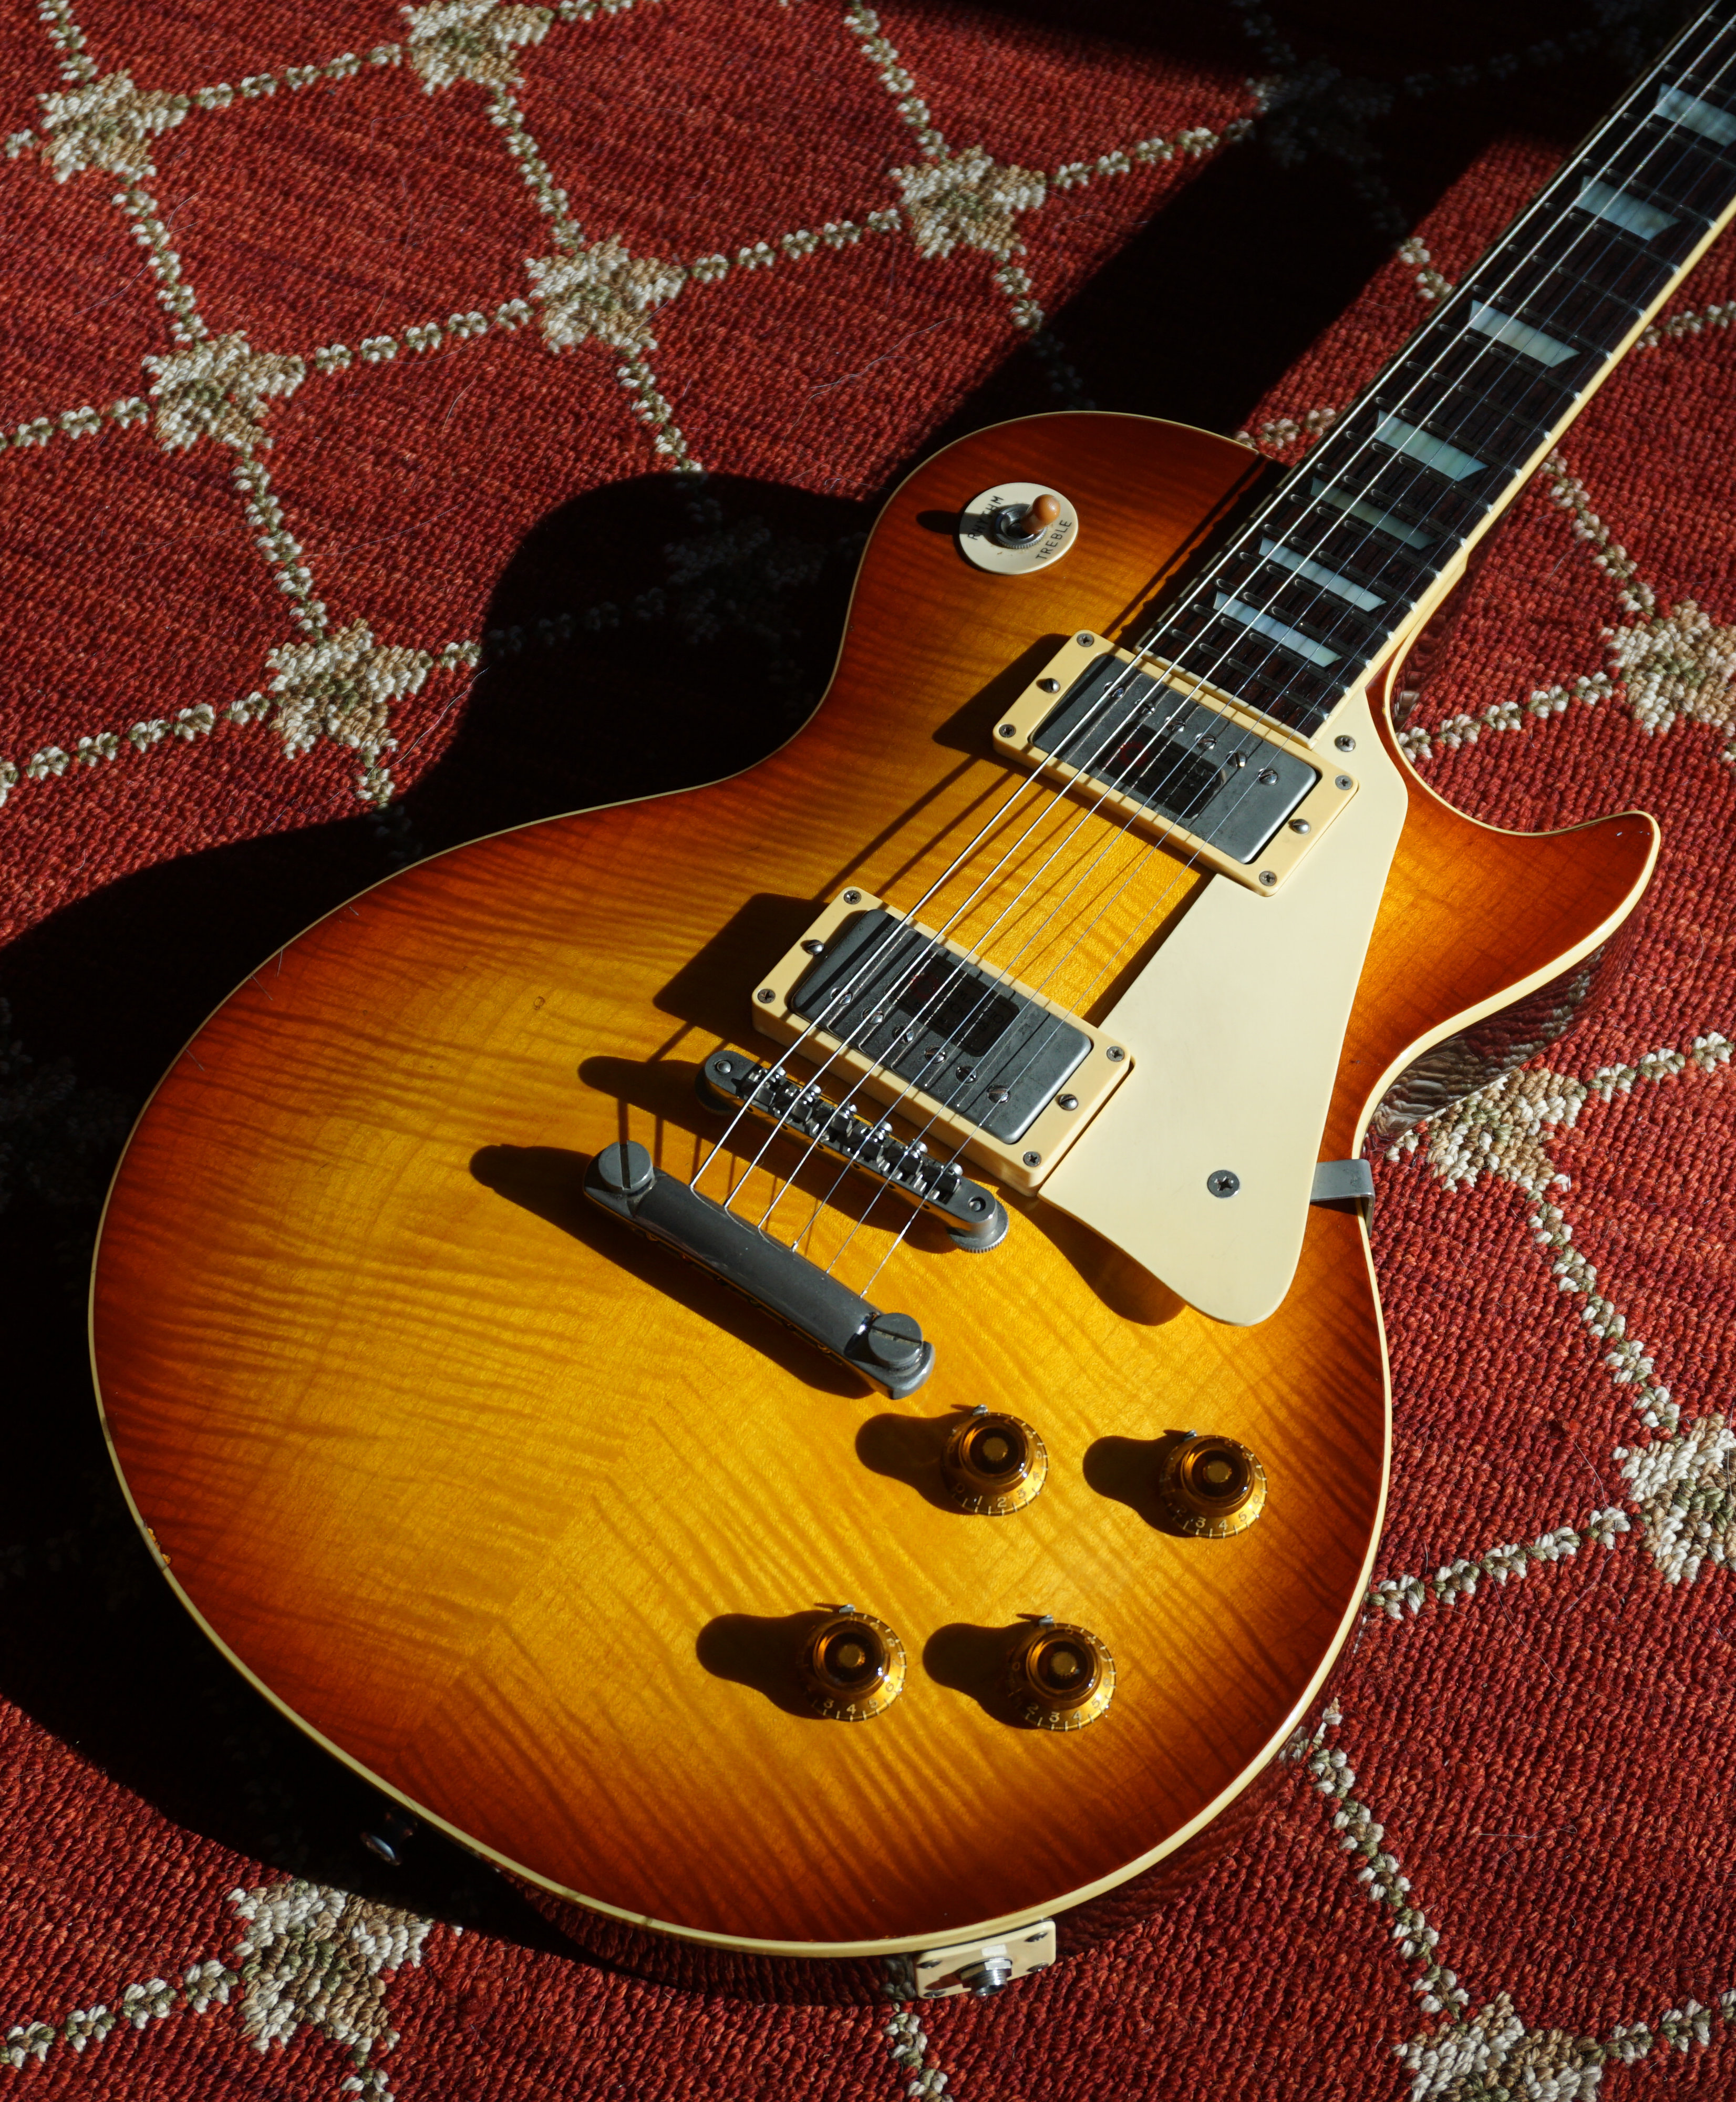 1981 Greco EGF 1000